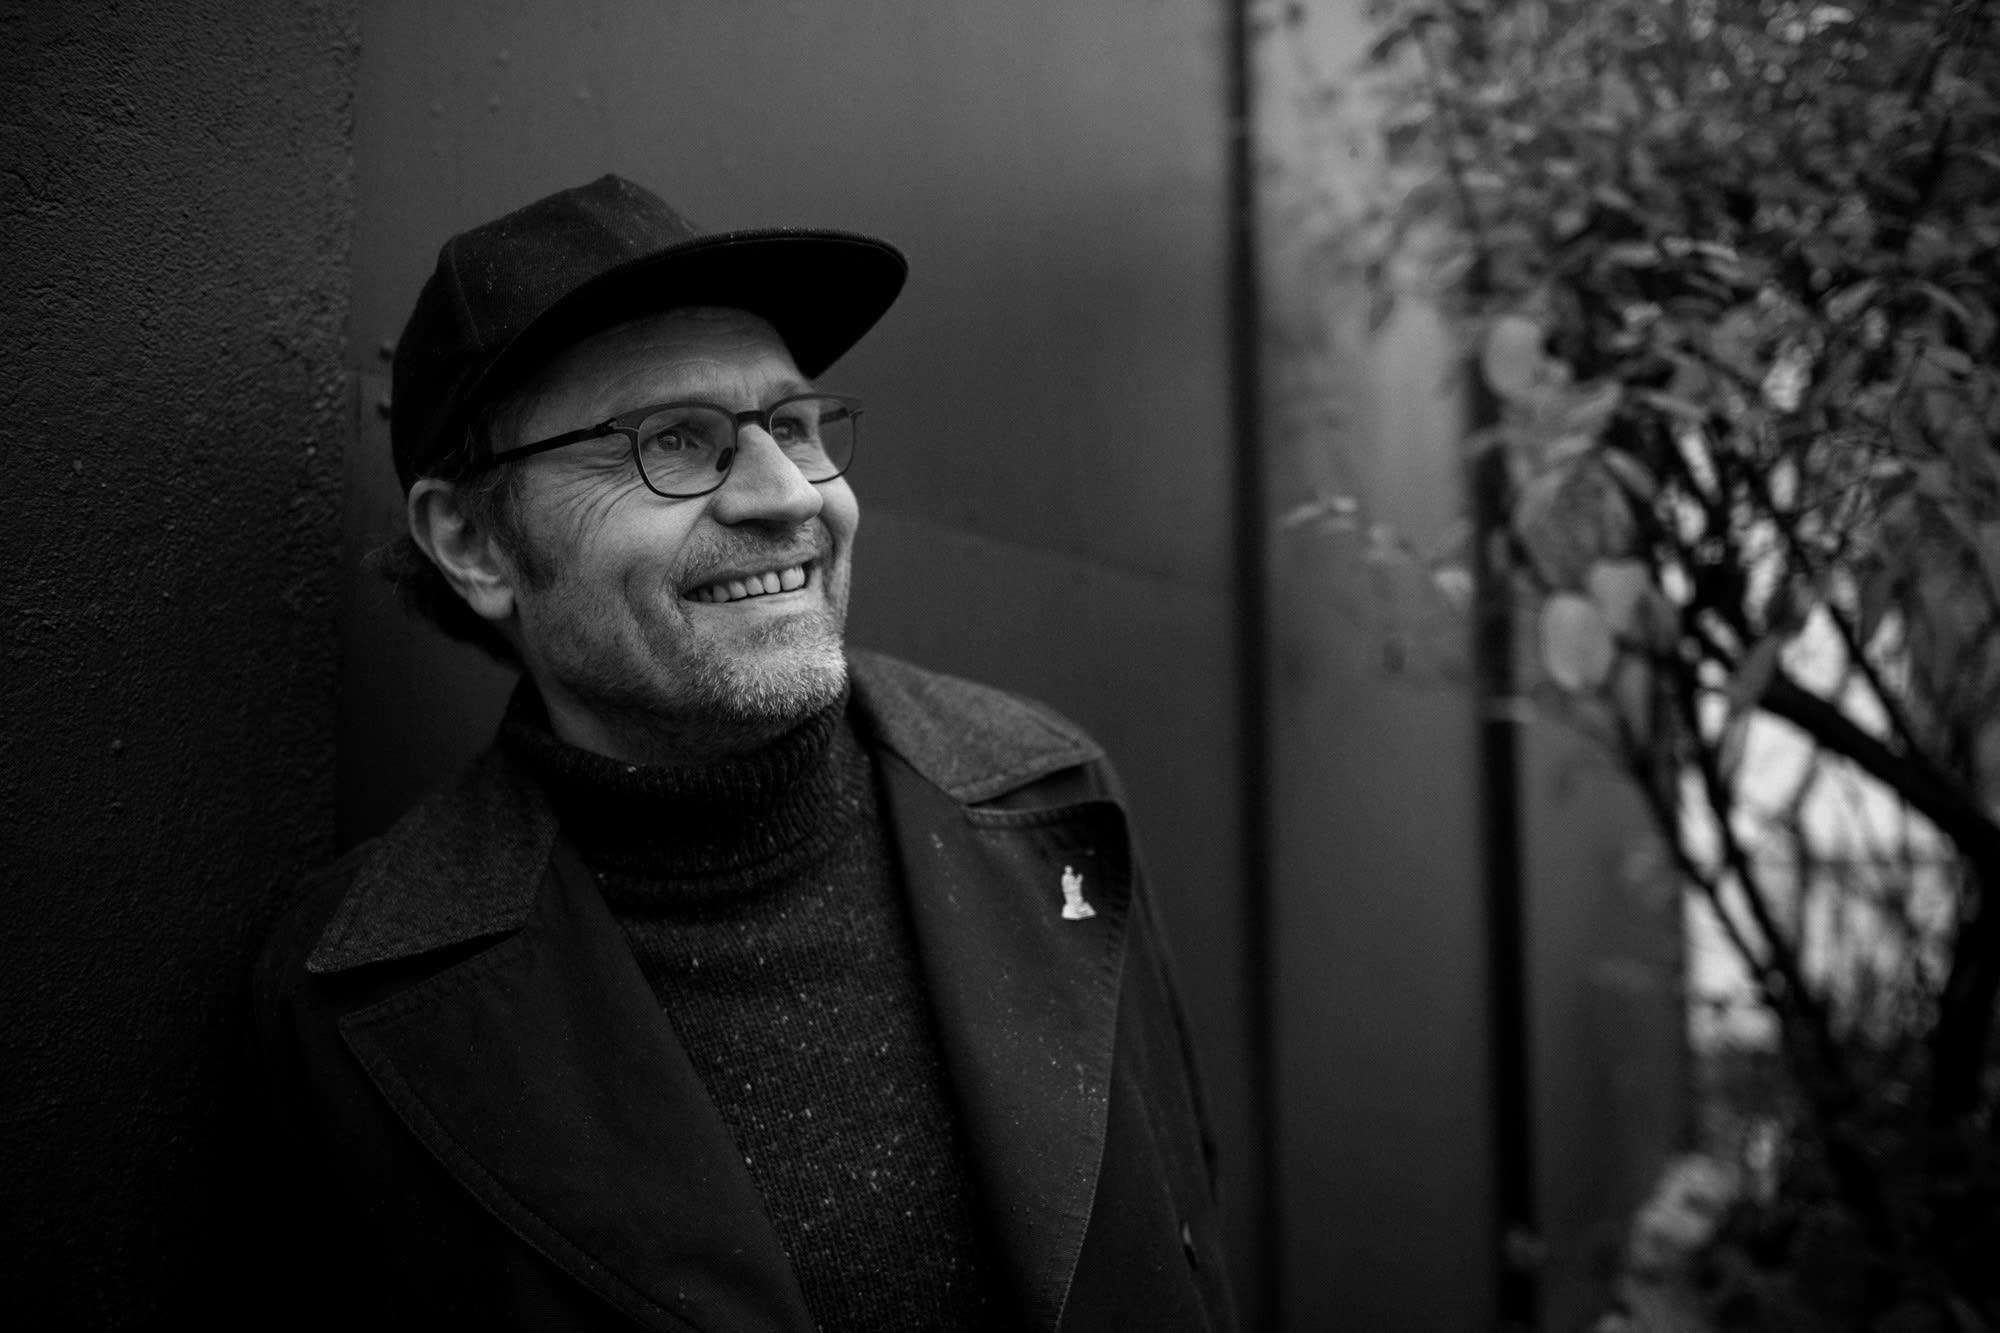 Einar Orn of The Sugarcubes